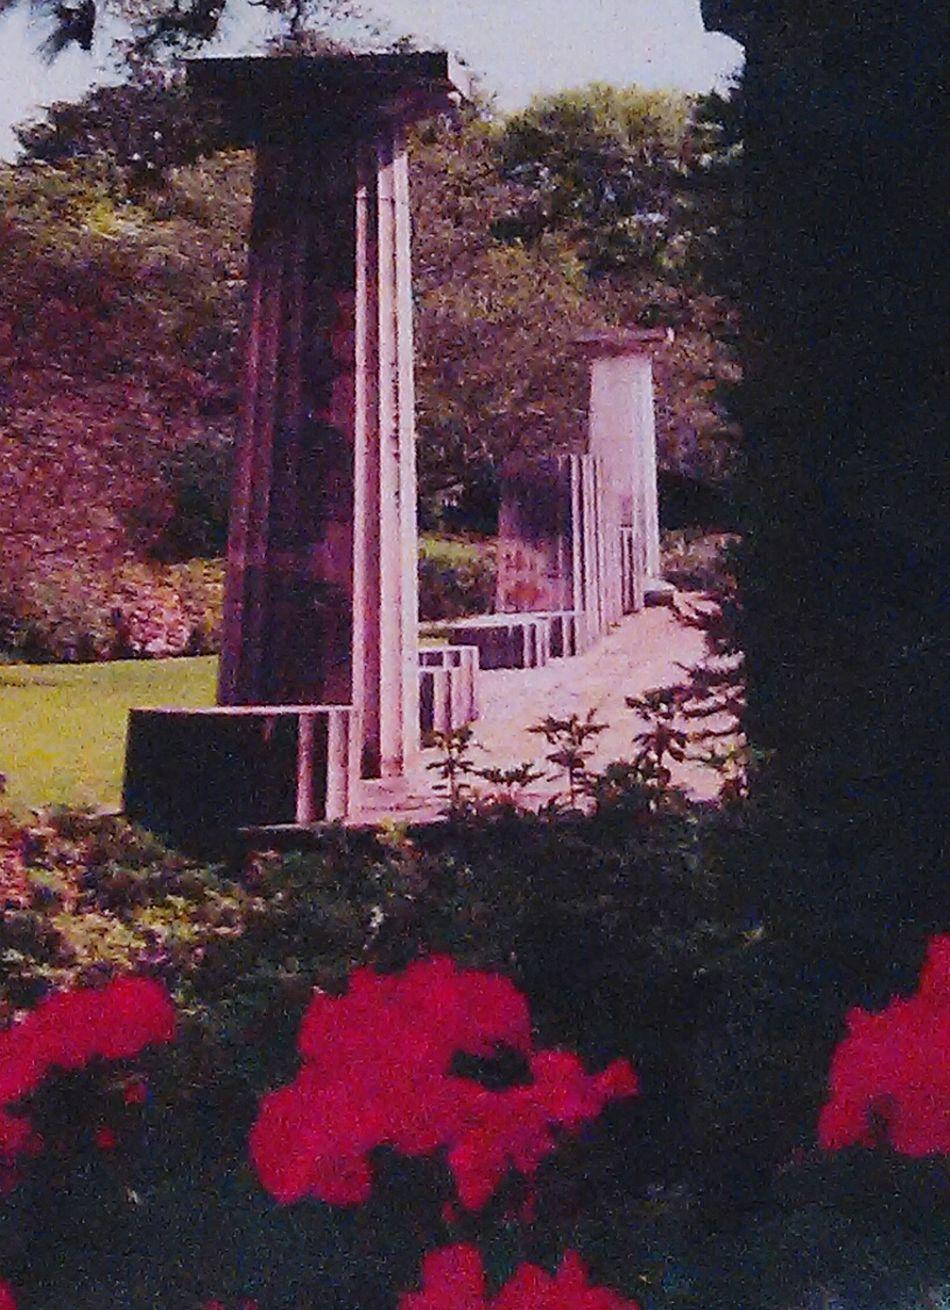 Jasmine Hill Gardens Wetumpka, AL Azelia Gardens Gardenscapes Check This Out Showcase: February